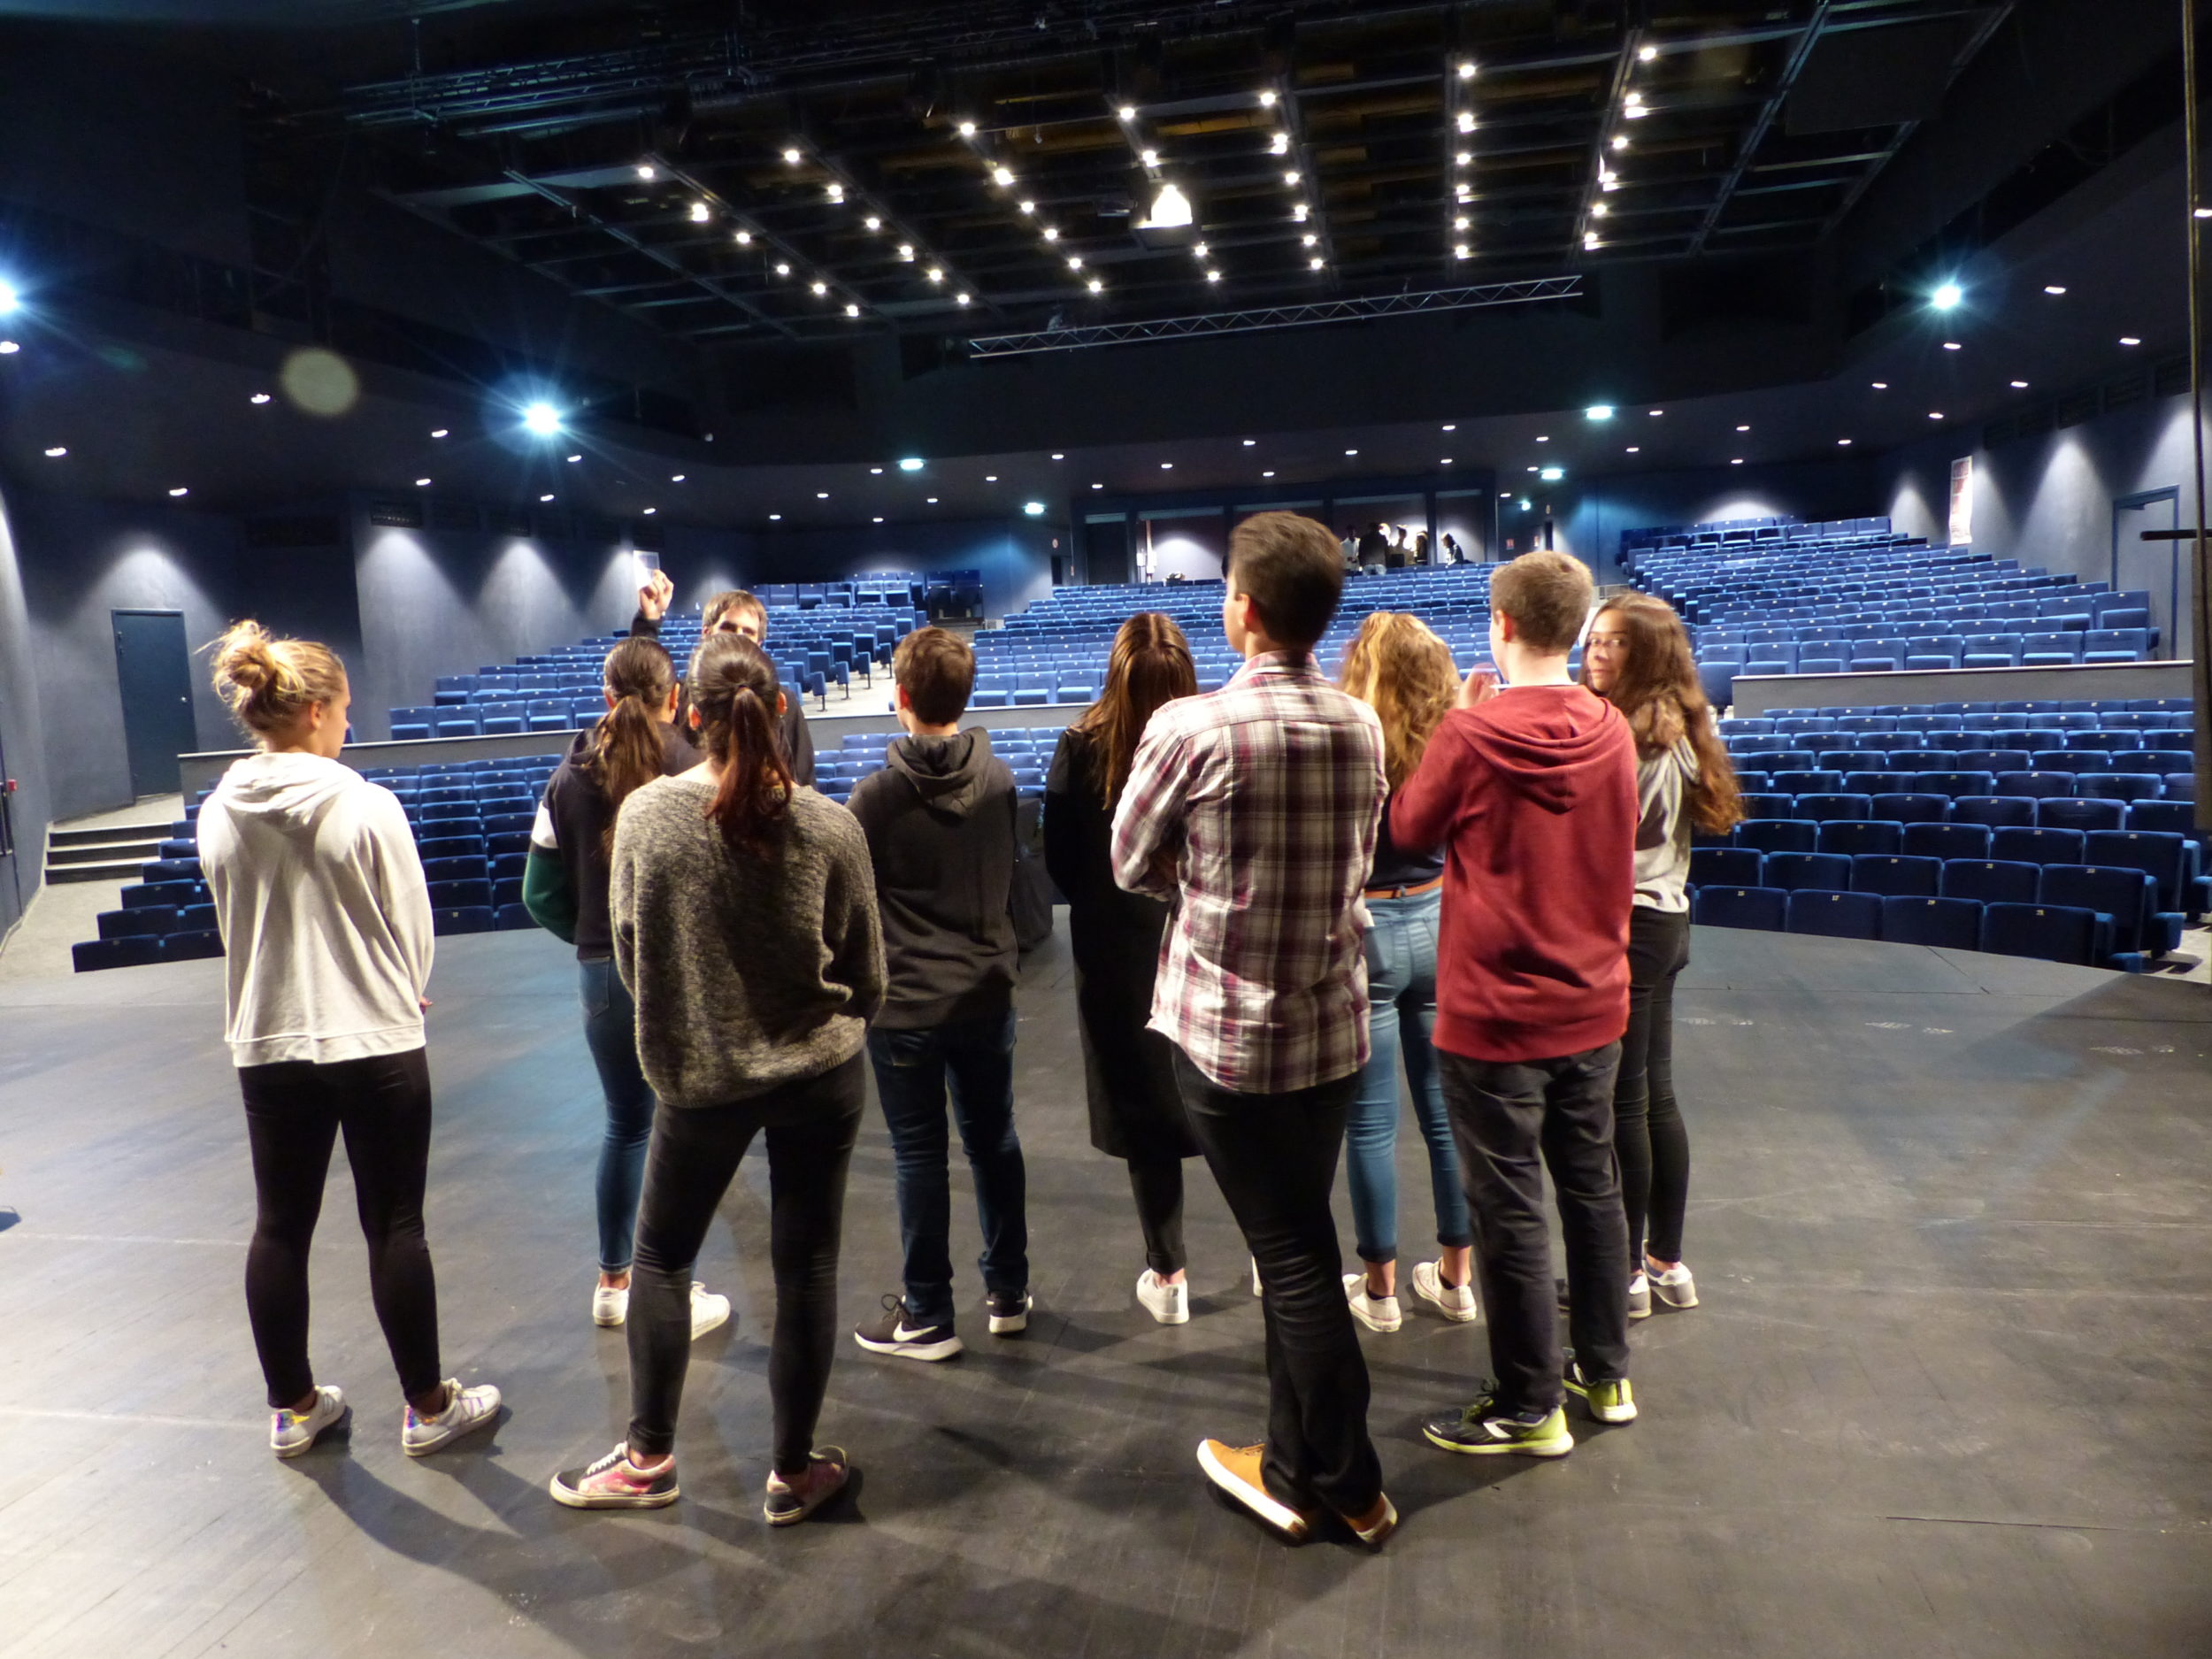 Visite_theatre ©Theatre de Chelles965